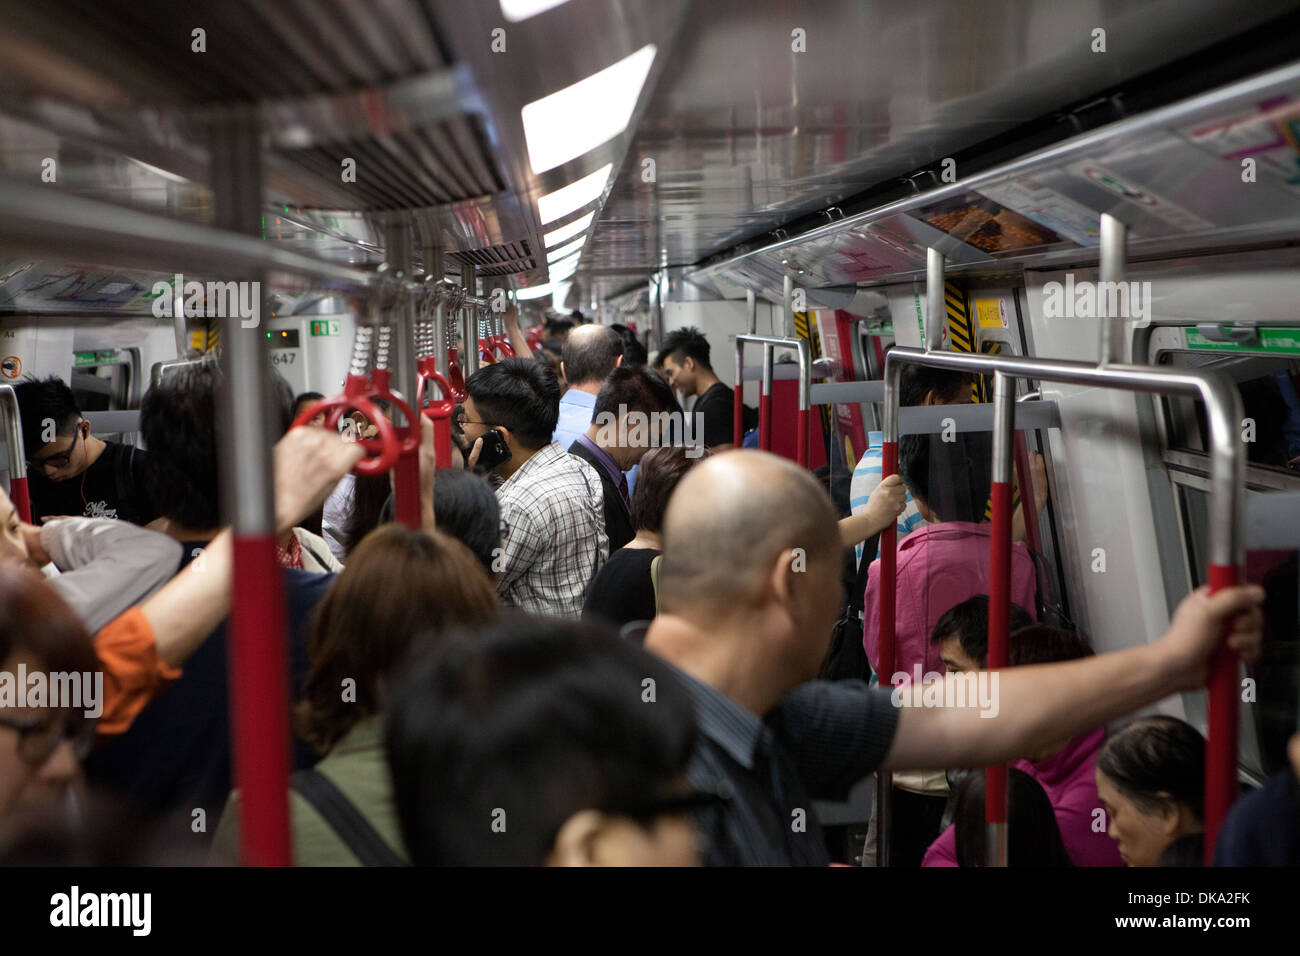 Internal view of Hong Kong Underground MTR train - Mass Transit Railway. - Stock Image